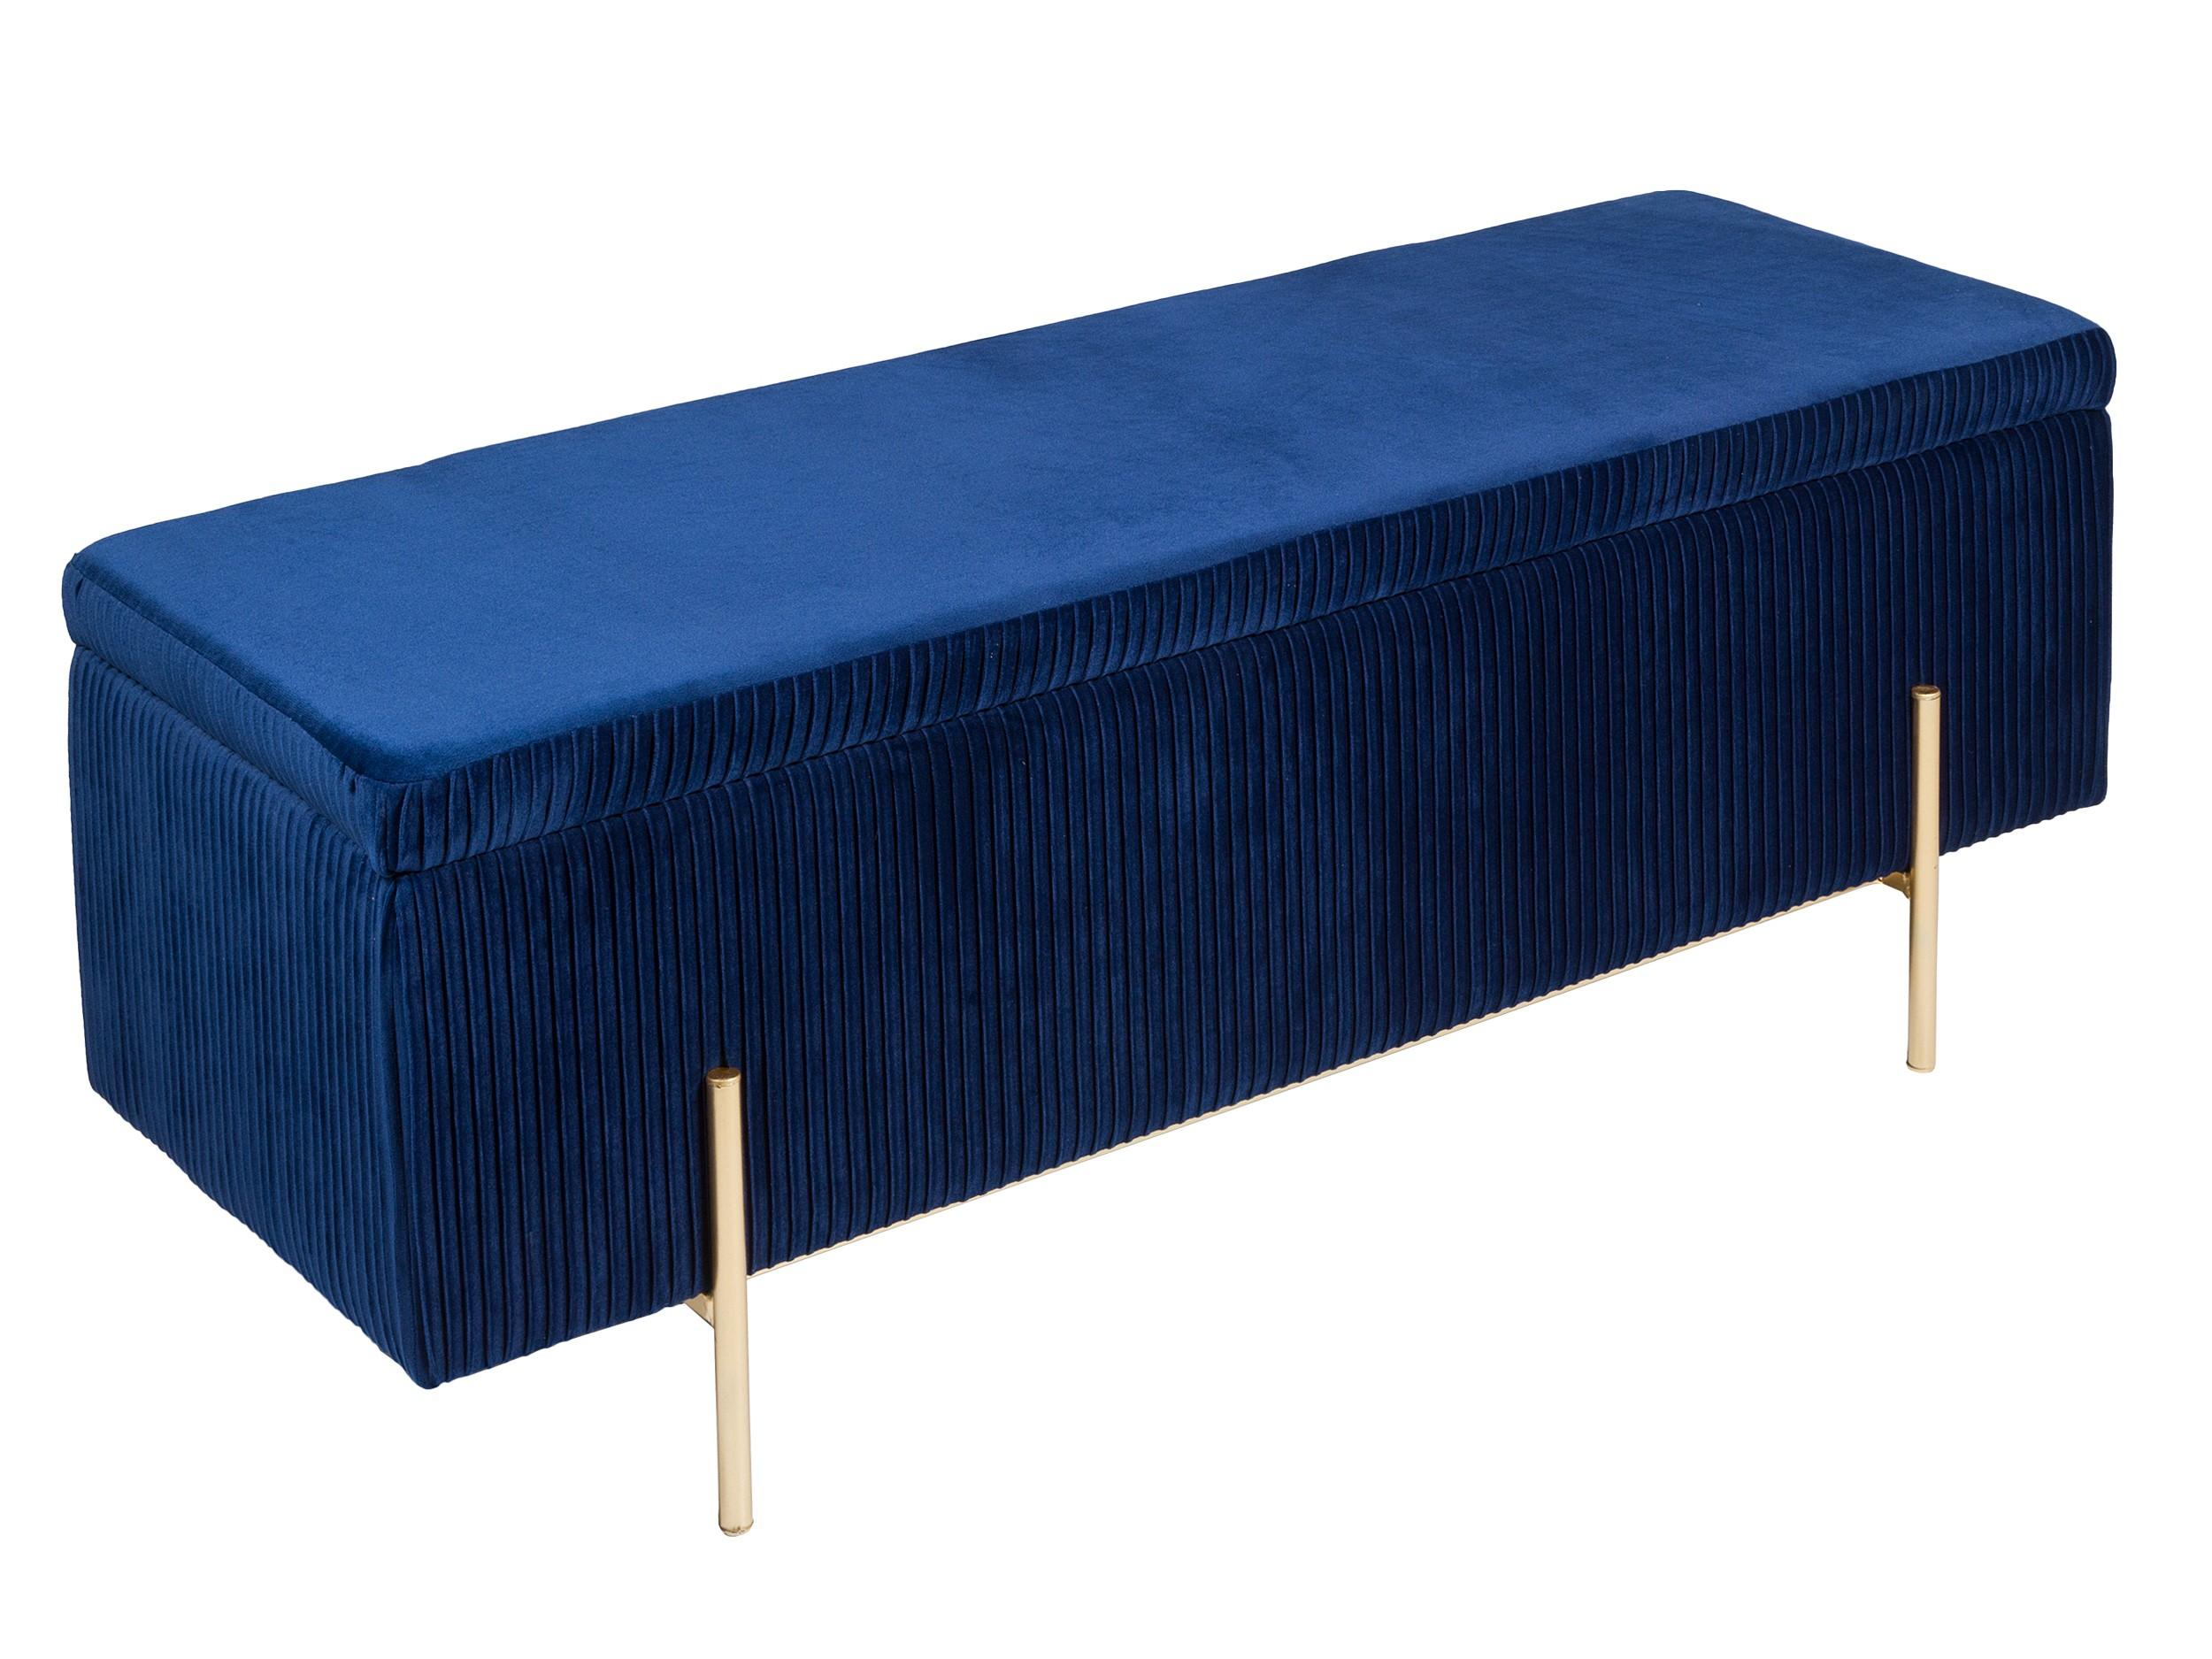 Malle Comme Table Basse banc / malle - scarlett - velours navy & laiton doré